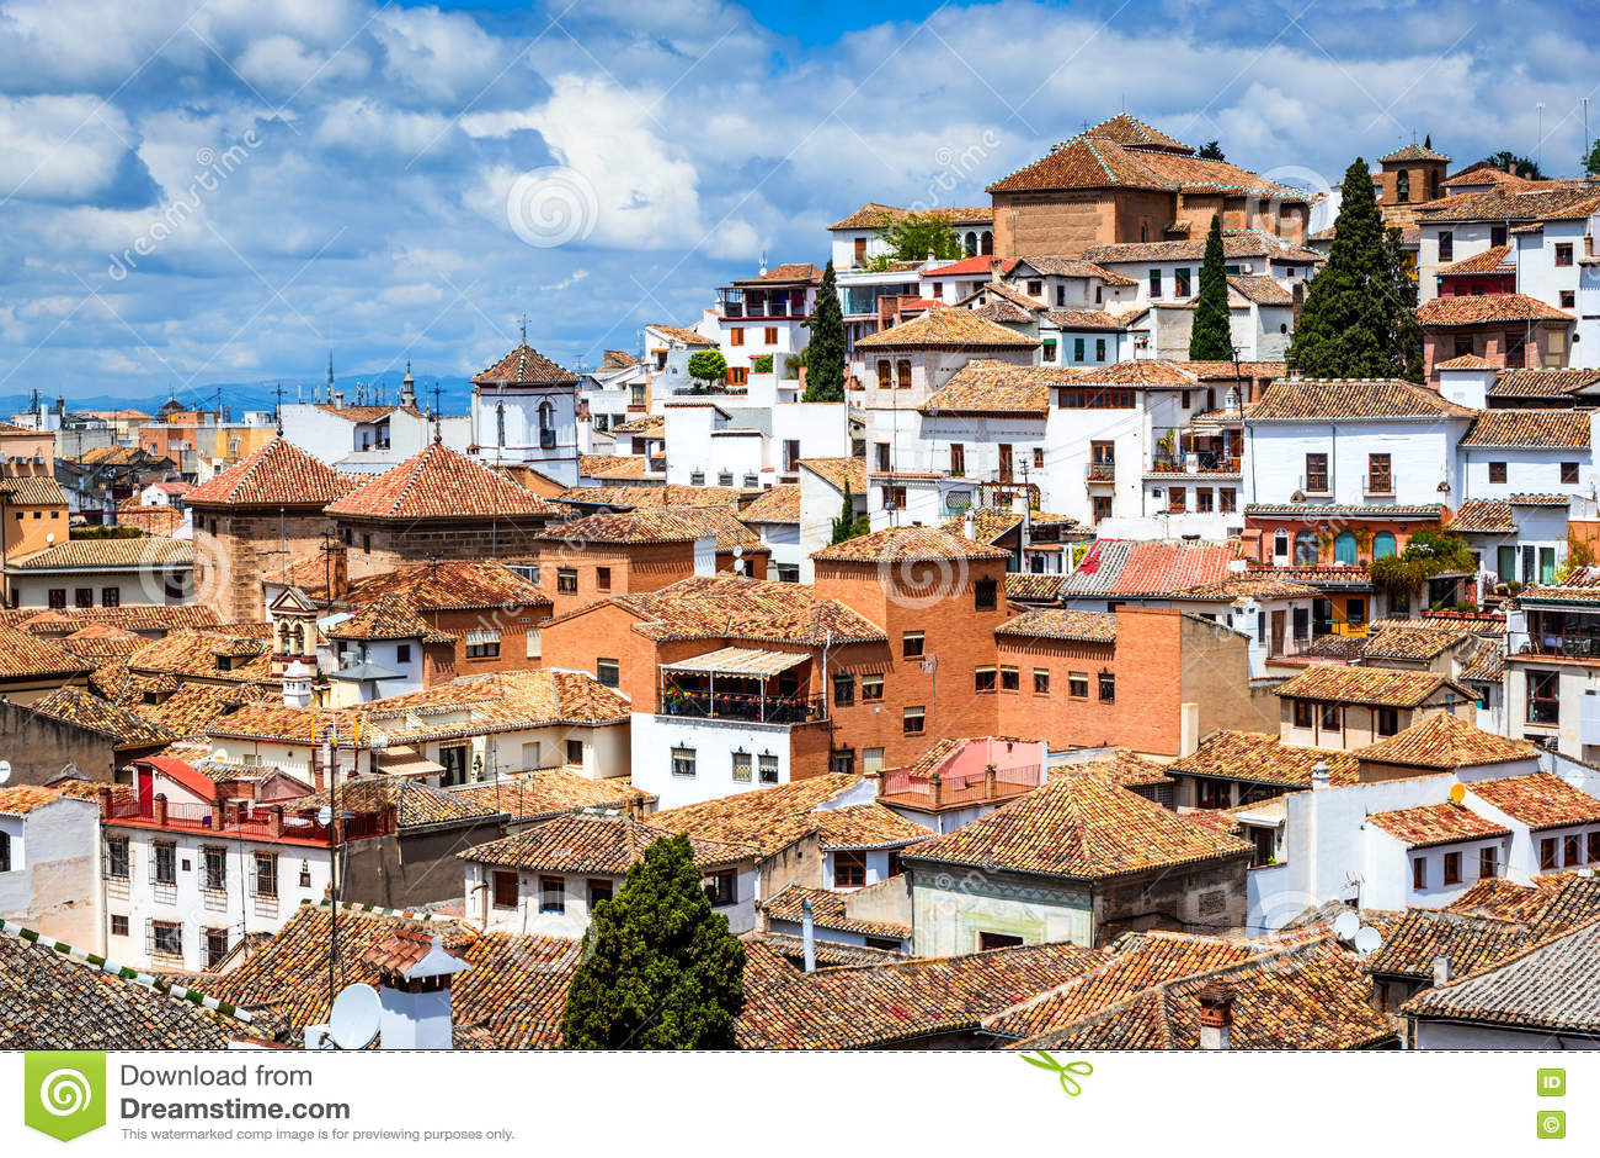 Granada - Albaicin Moorish Quarter, Andalusia In Spain Stock Image